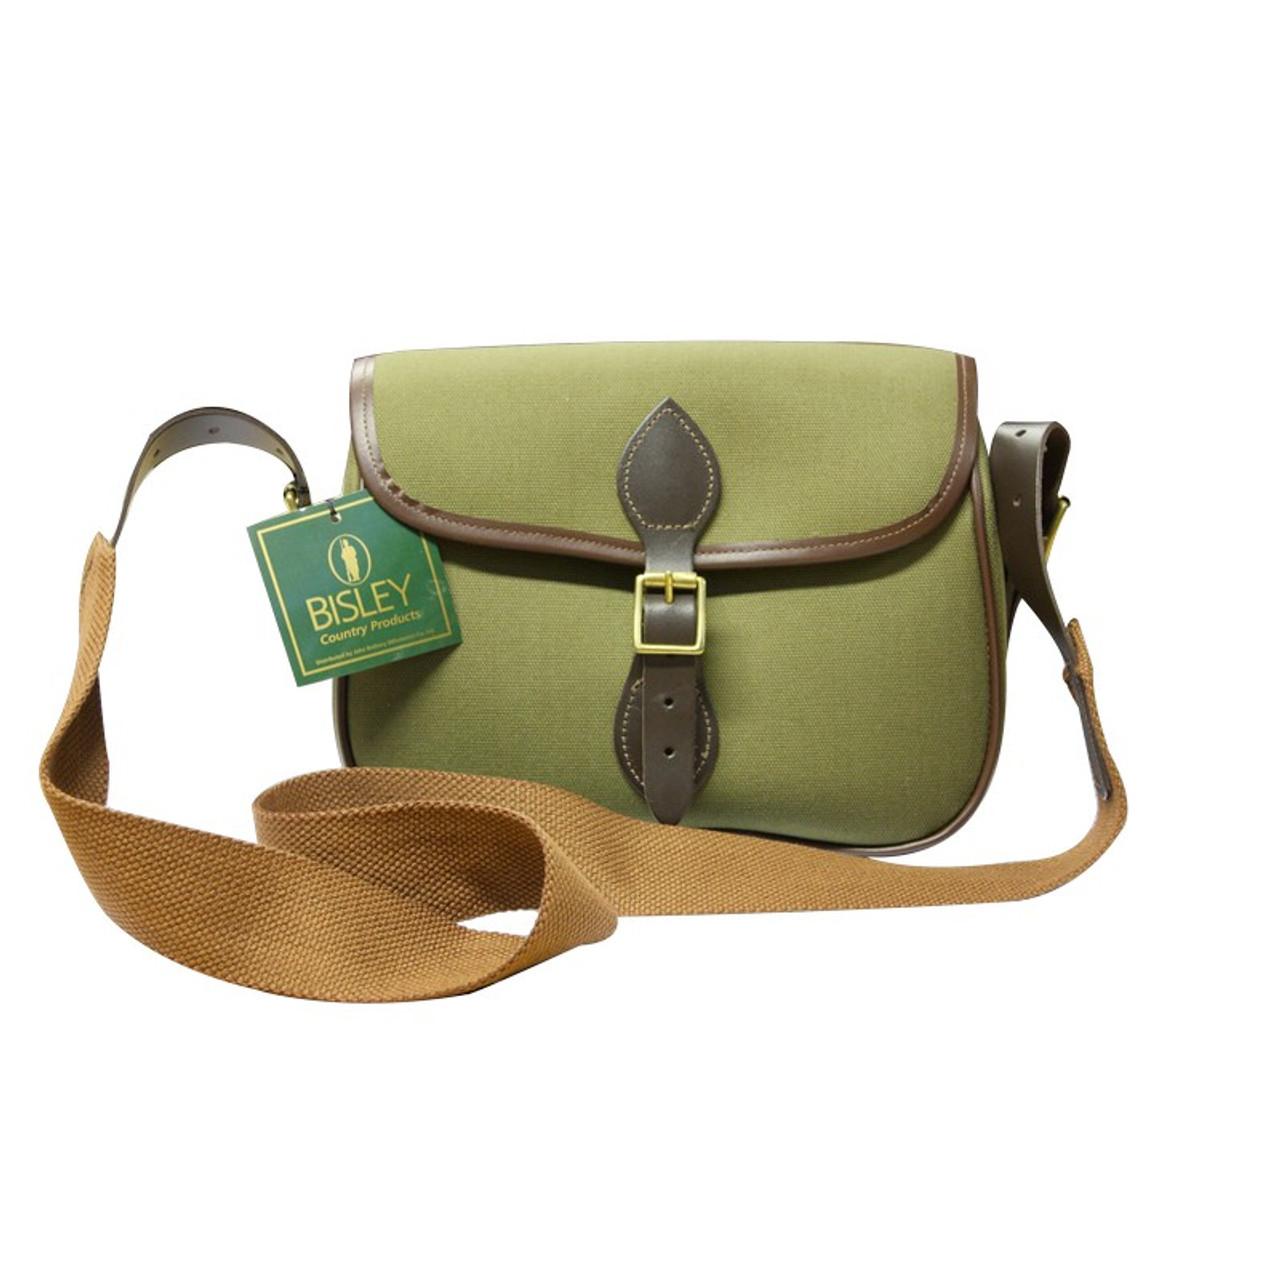 BISLEY FOX canvas game bag QUALITY leather//brass fittings shooting hunting bag